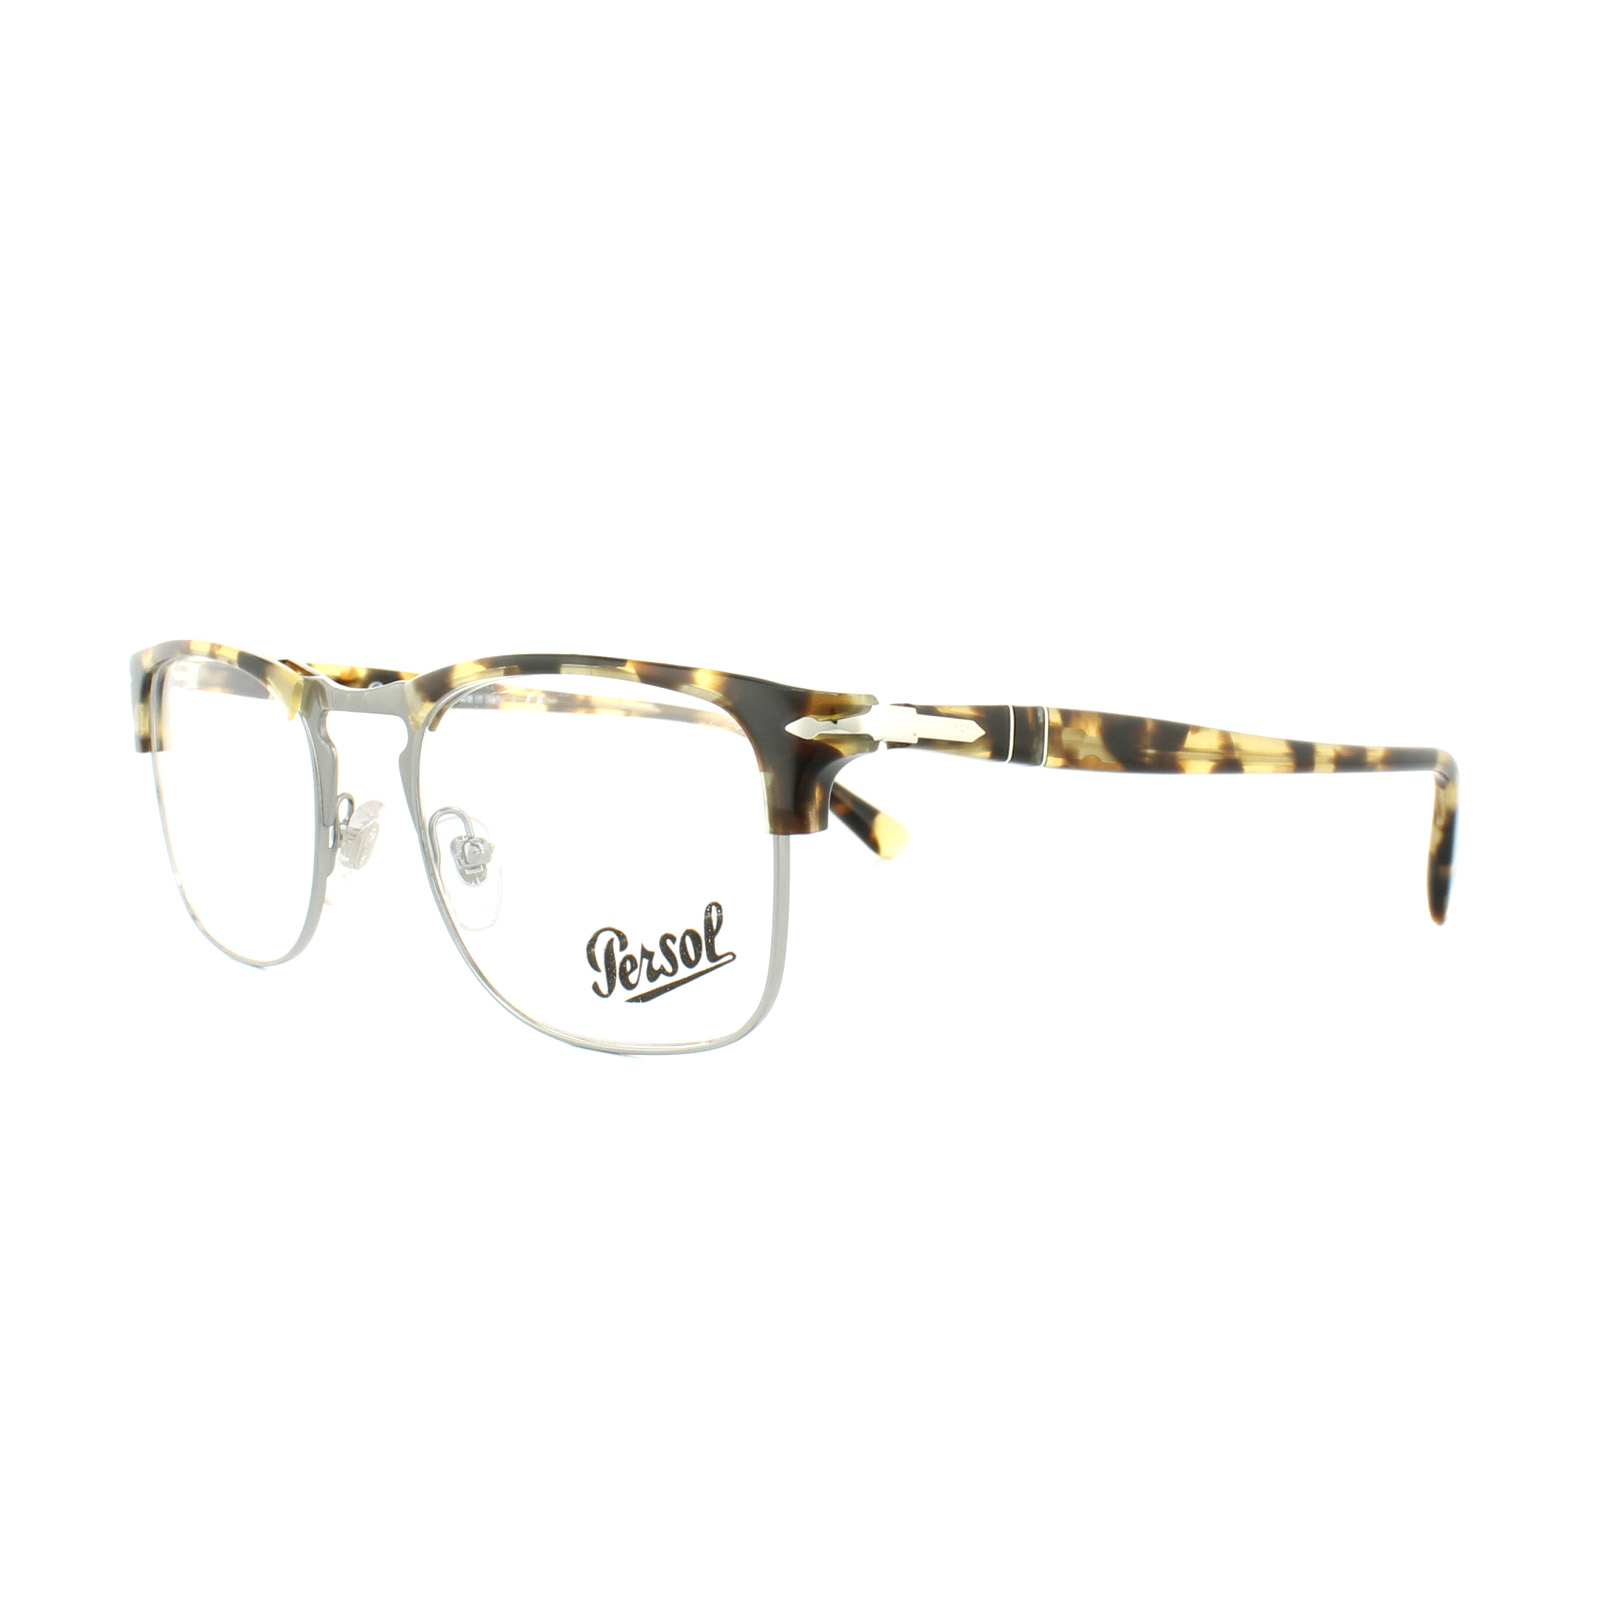 90e426ce3912e Sentinel Persol Glasses Frames PO 8359V 1056 Brown Beige Tortoise Mens 51mm